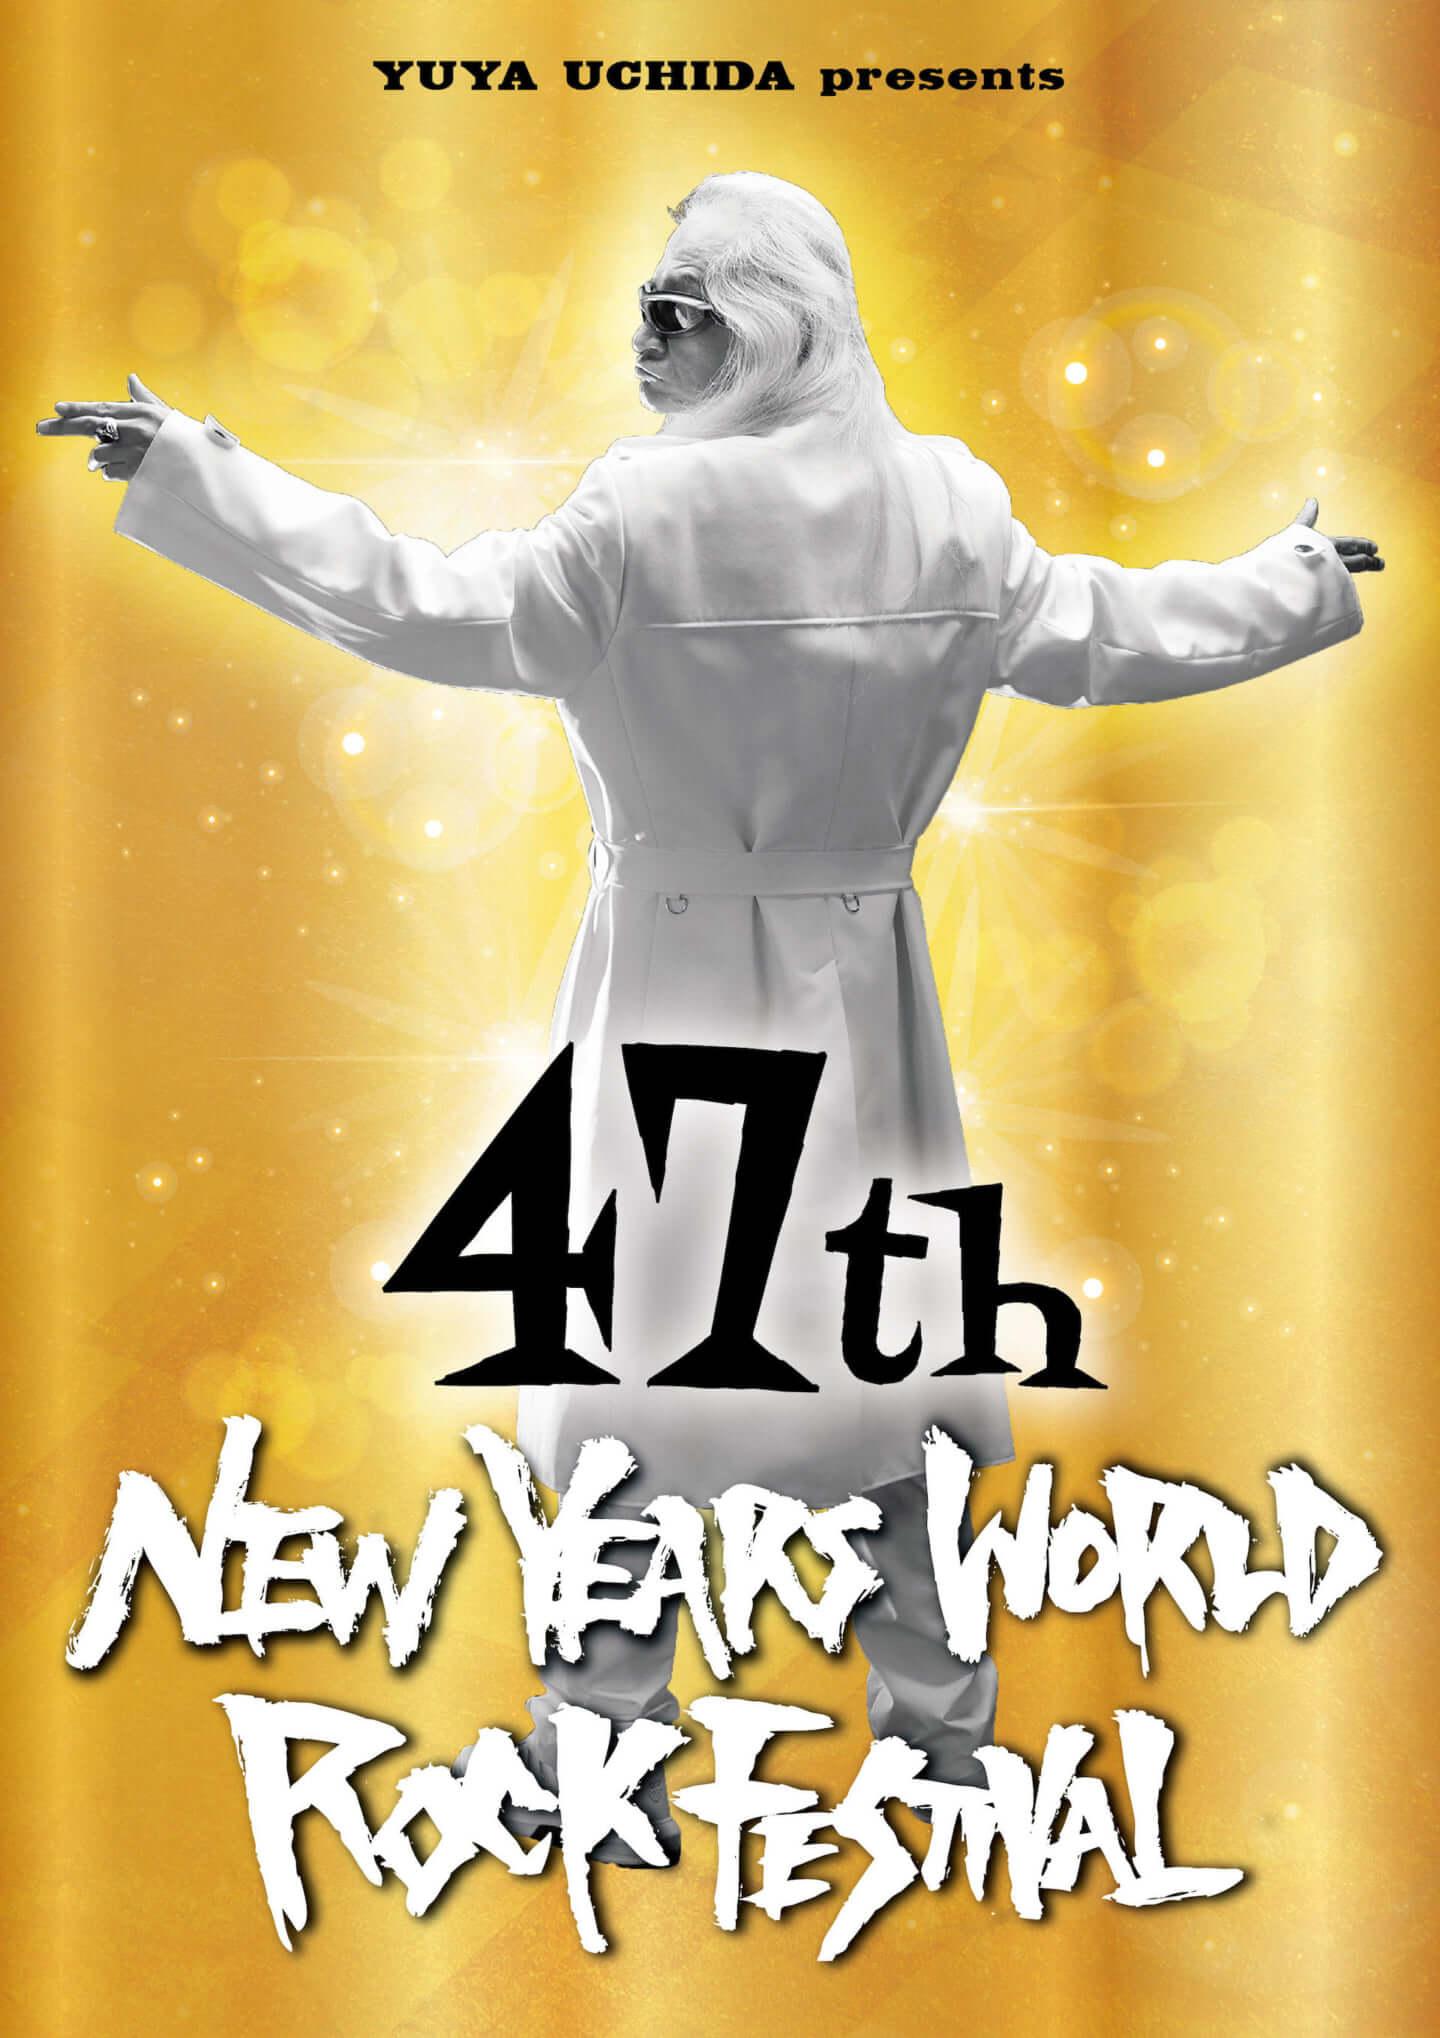 <47th NEW YEARS WORLD ROCK FESTIVAL>内田裕也追悼特集開催!シーナ&ロケッツ、高木完が登場 music191114_nywrockfes_01-1440x2038